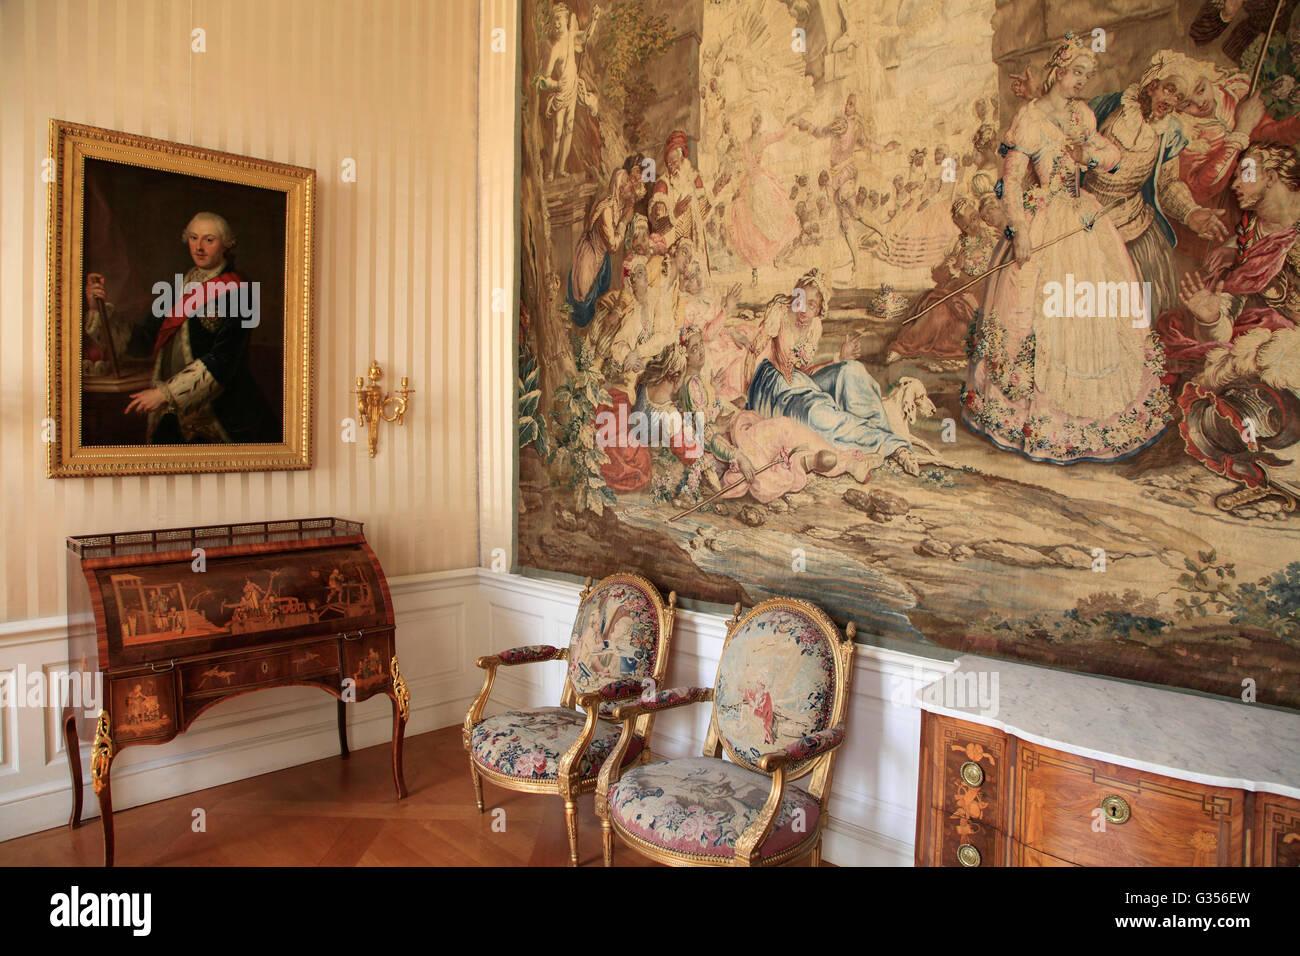 residenz stockfotos residenz bilder alamy. Black Bedroom Furniture Sets. Home Design Ideas